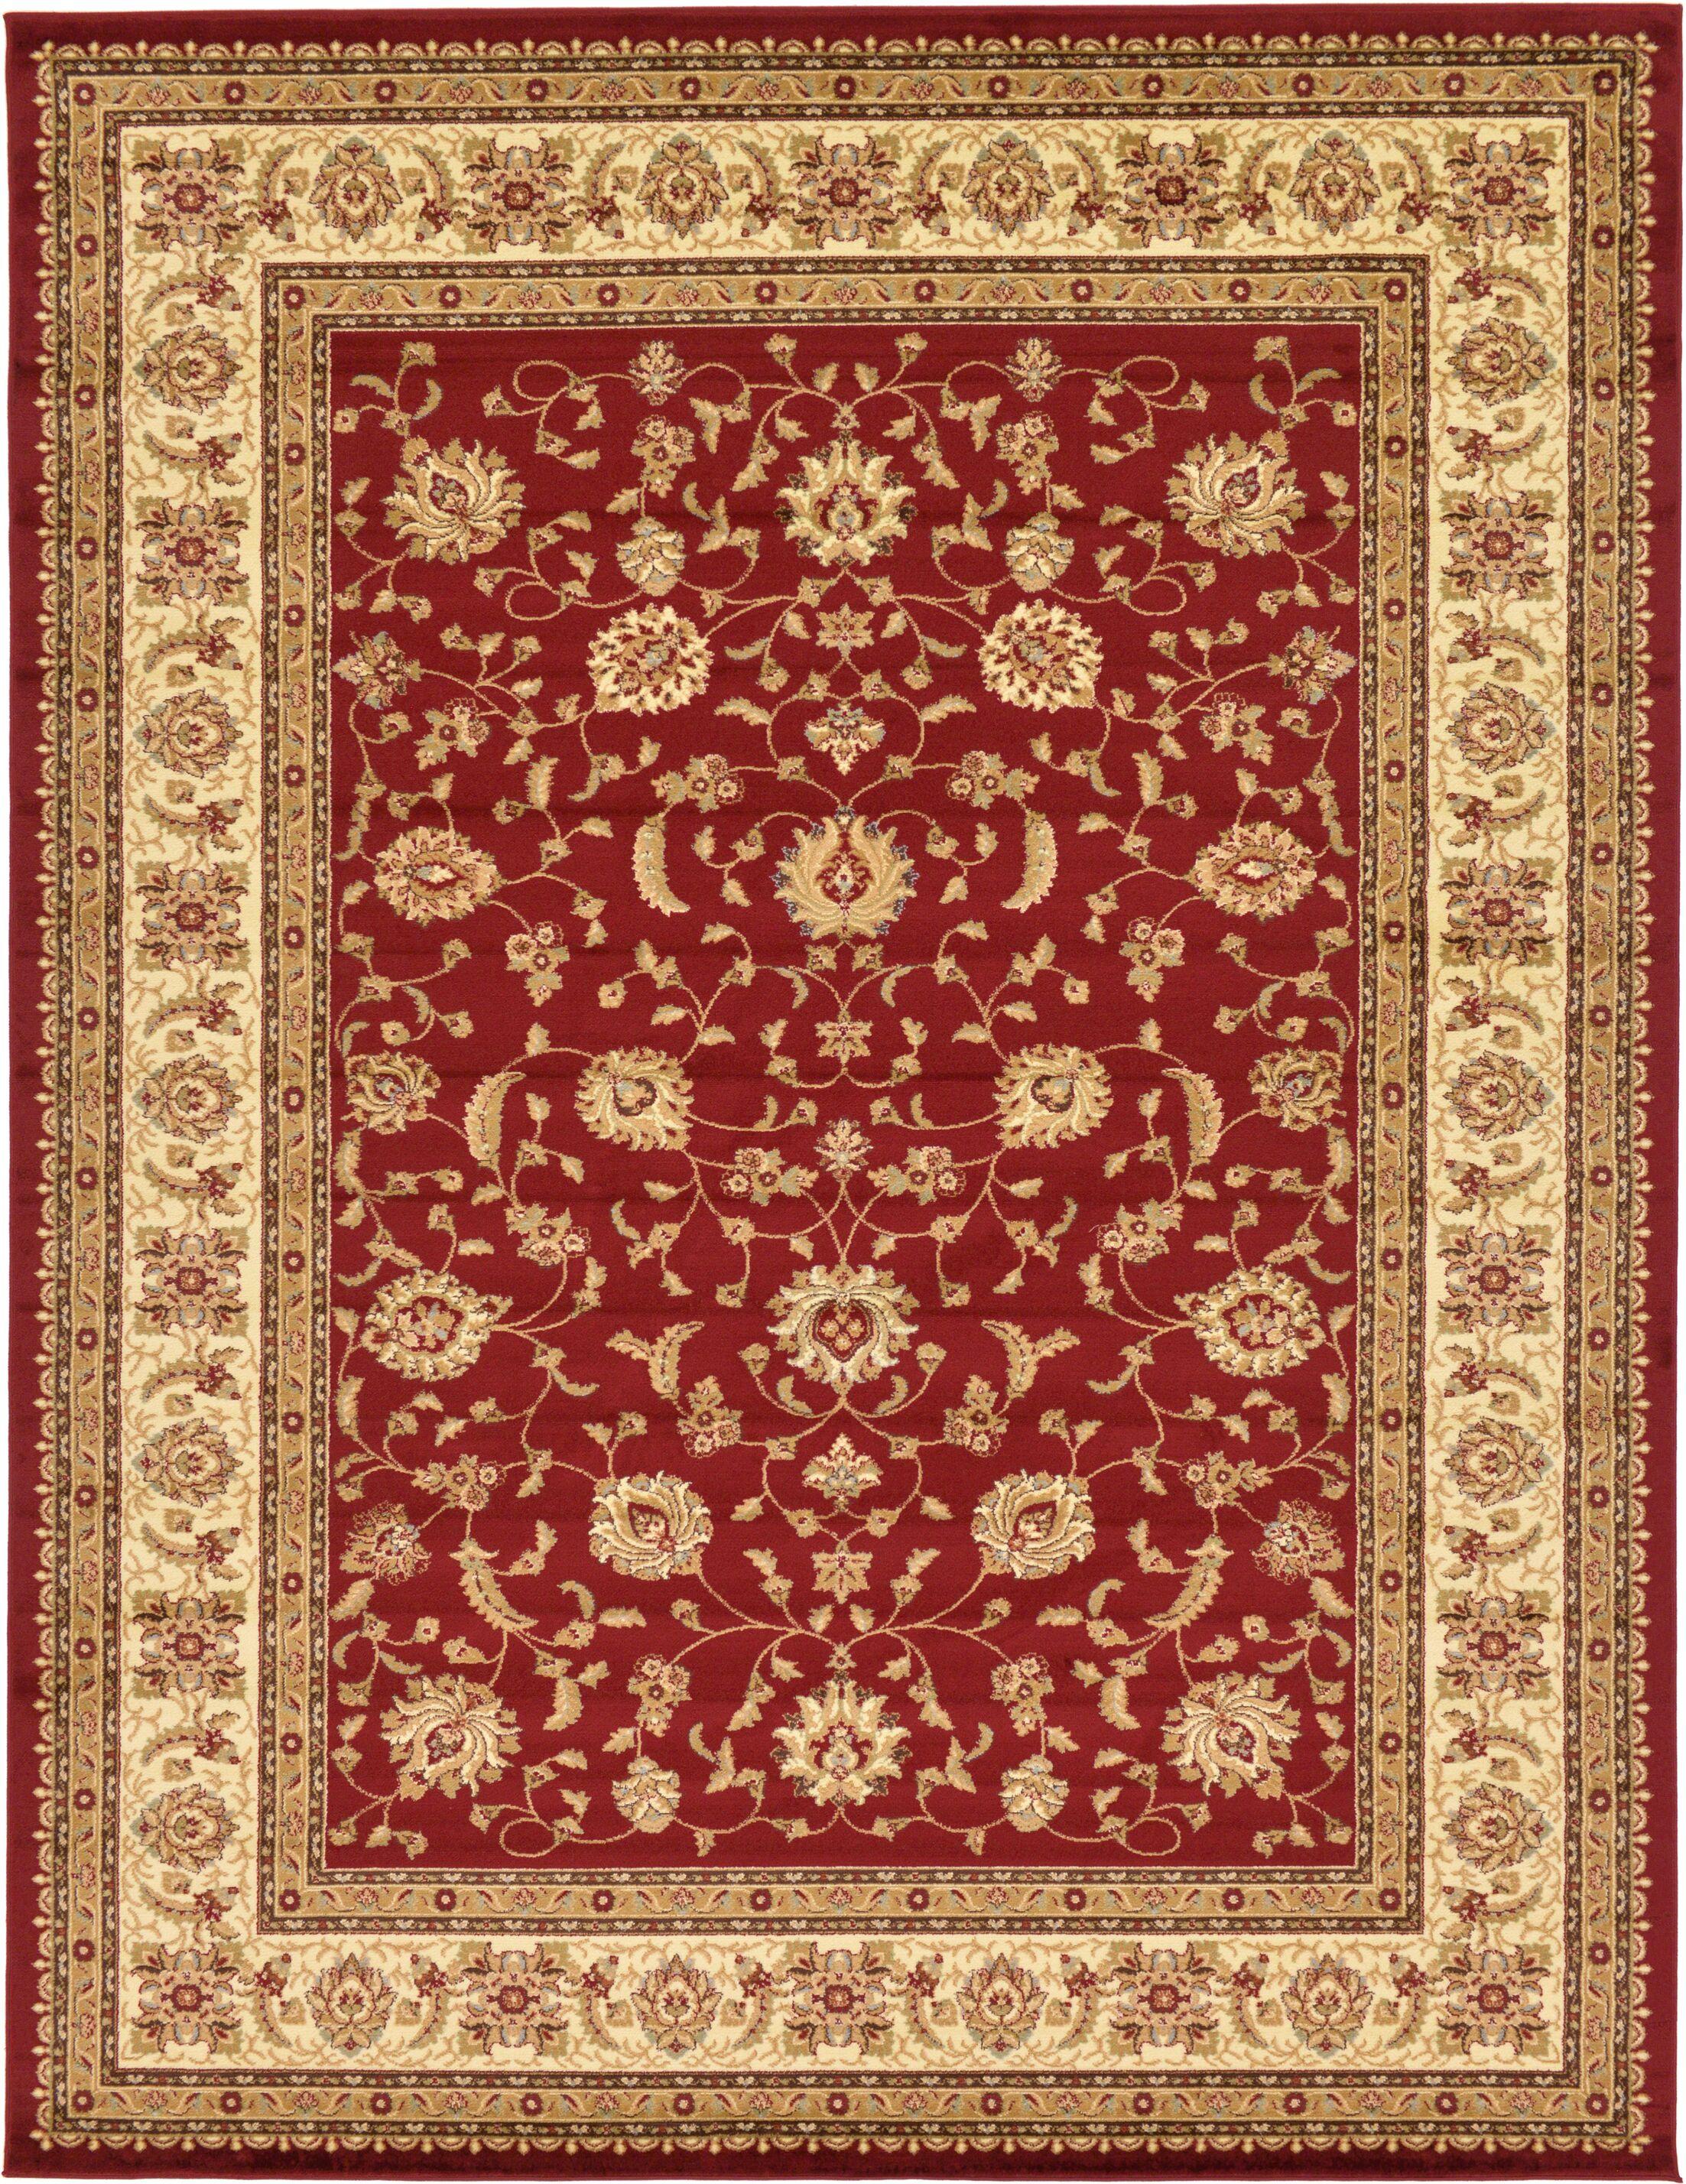 Fairmount Red/Cream Area Rug Rug Size: Rectangle 10' x 13'